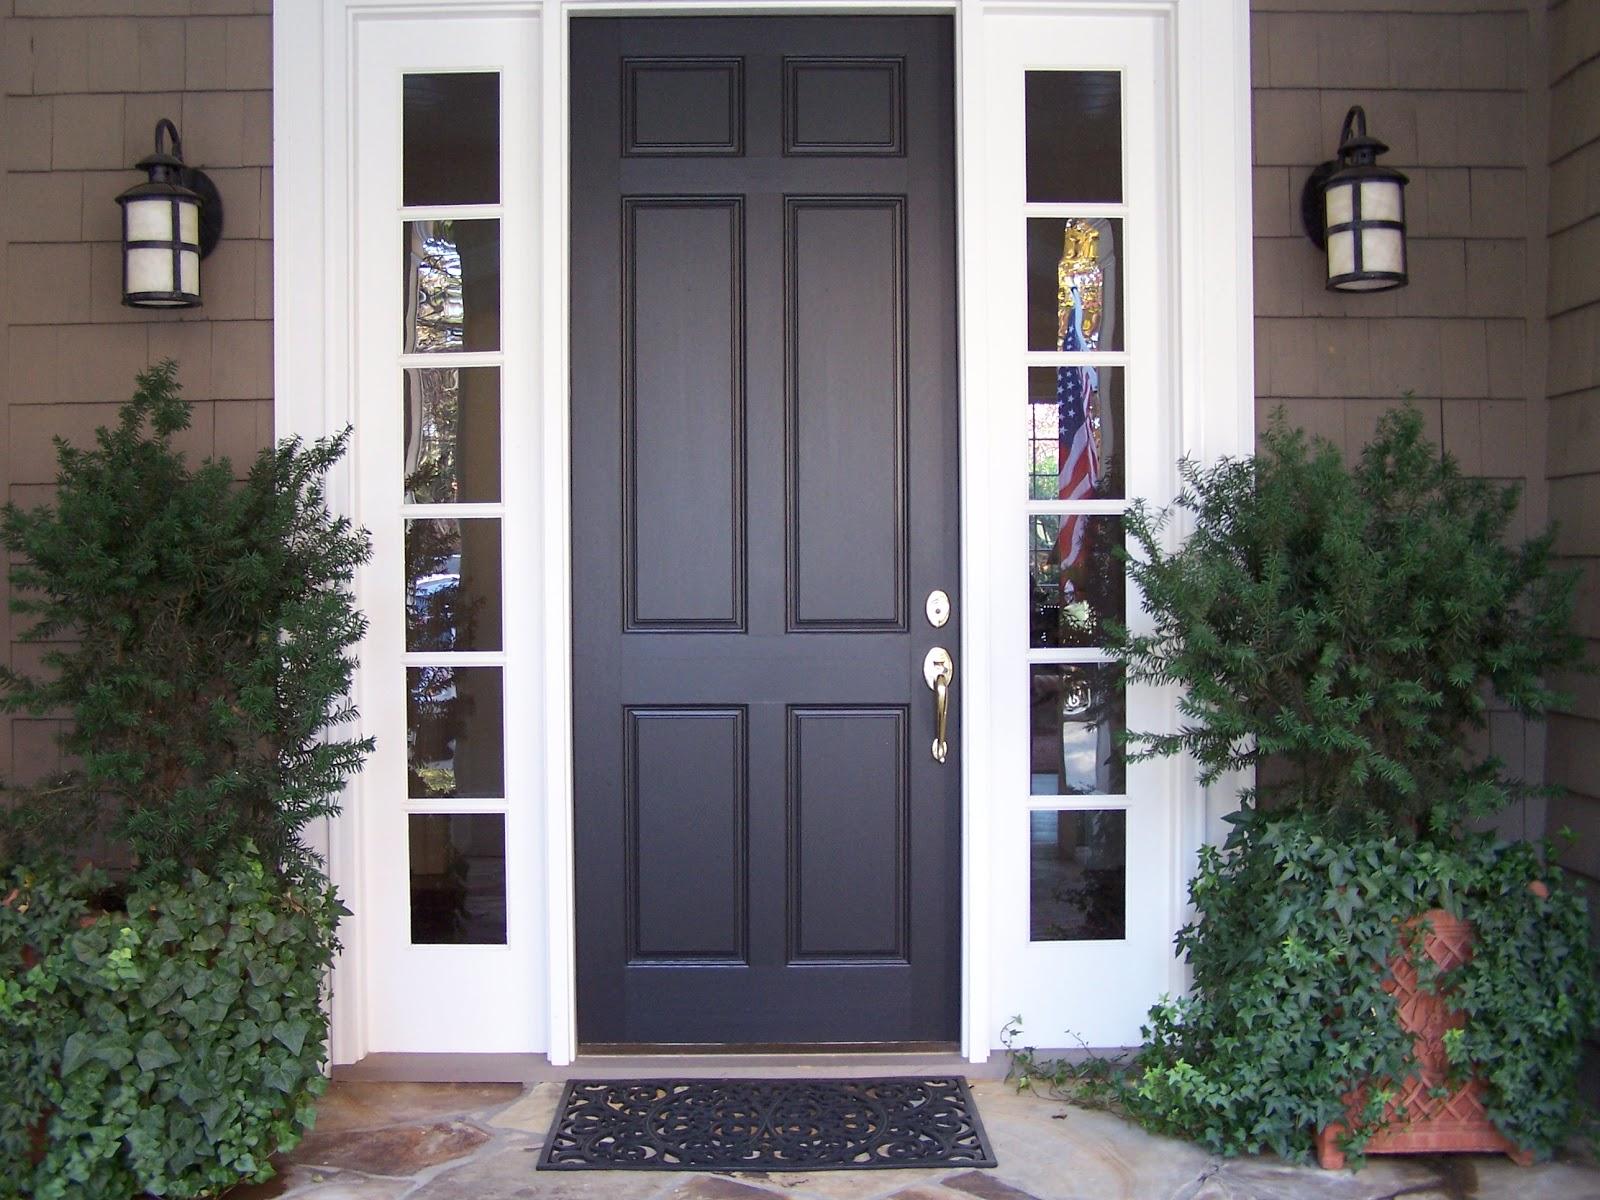 Tara dillard curb appeal color pots lights for Black exterior door with sidelights